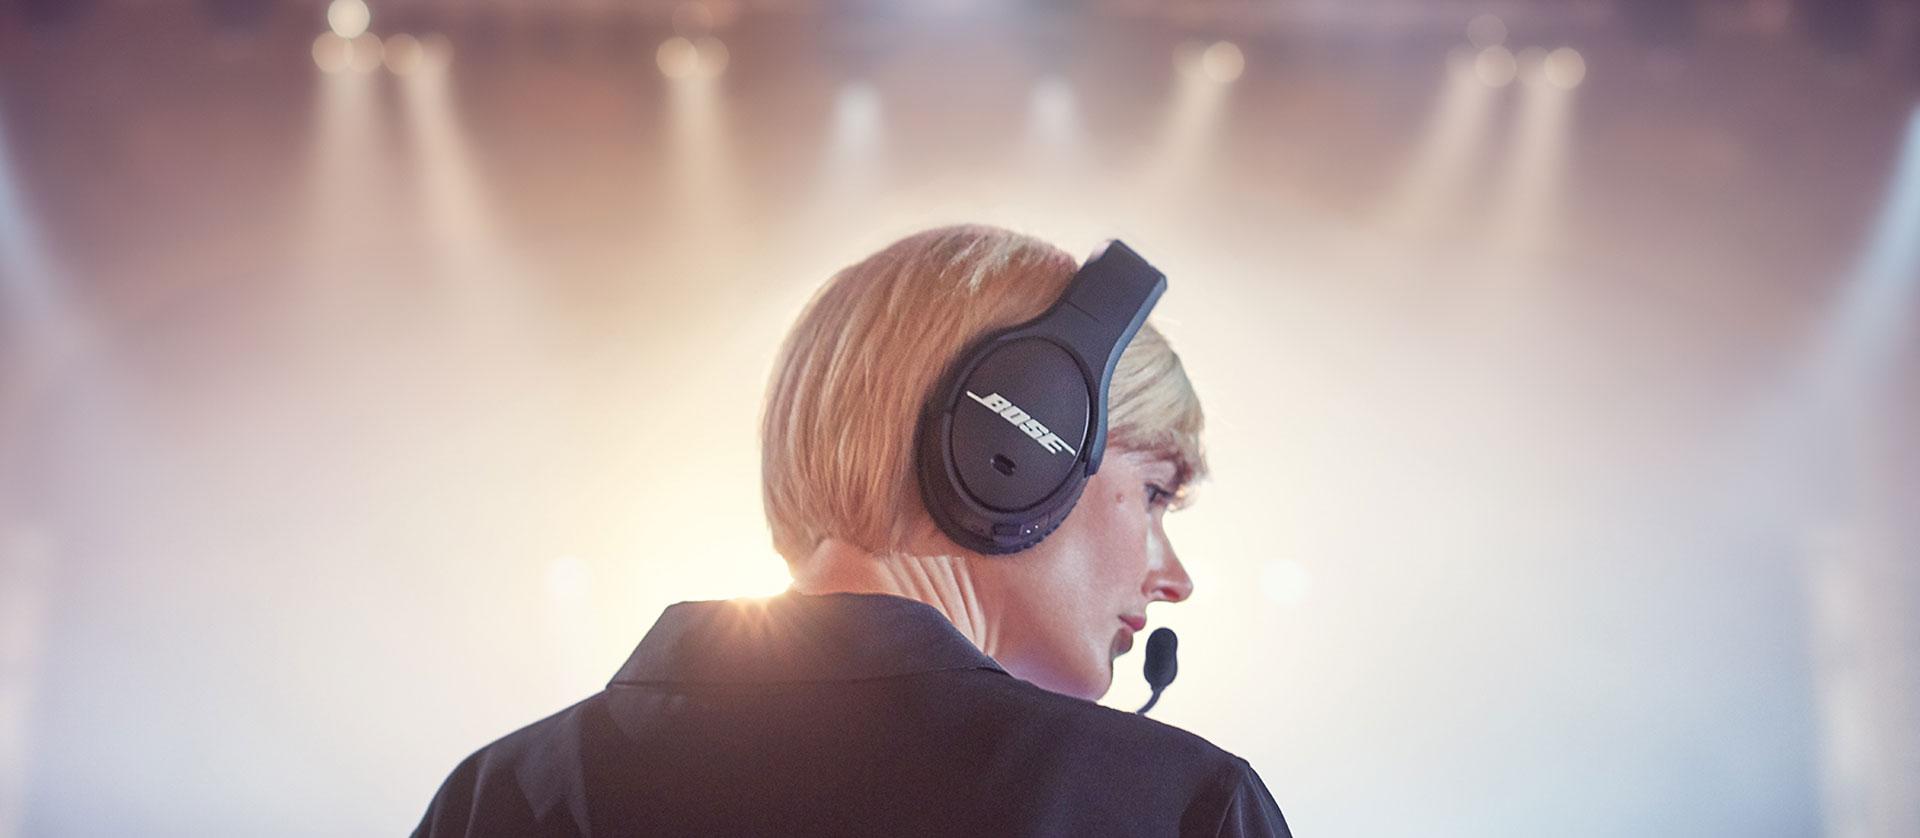 Female tech wearing Bose SoundComm B40 amid a backdrop of lights.